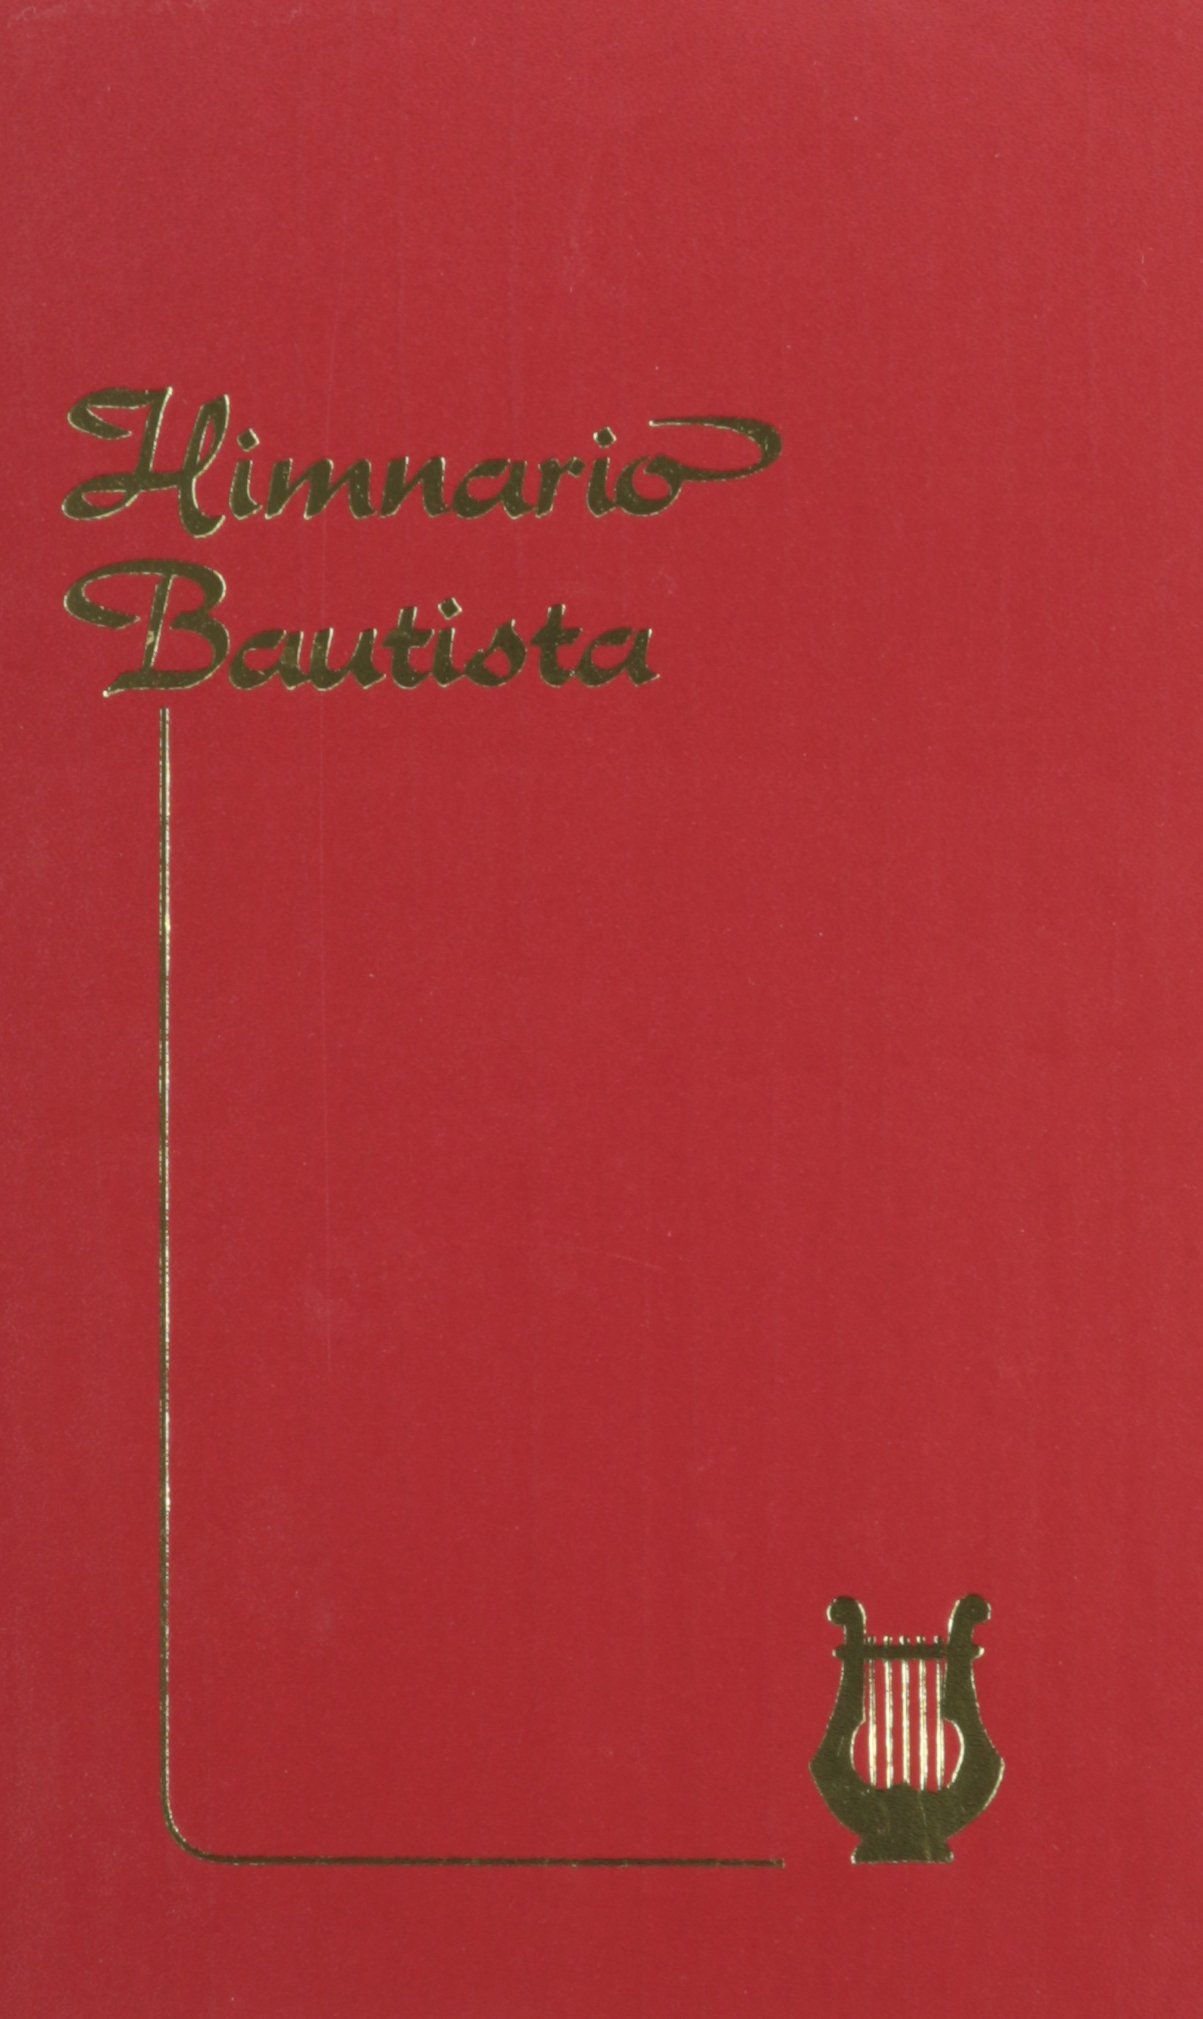 Himnario Bautista = Baptist Hymnal (Spanish Edition) by Casa Bautista of Pubns